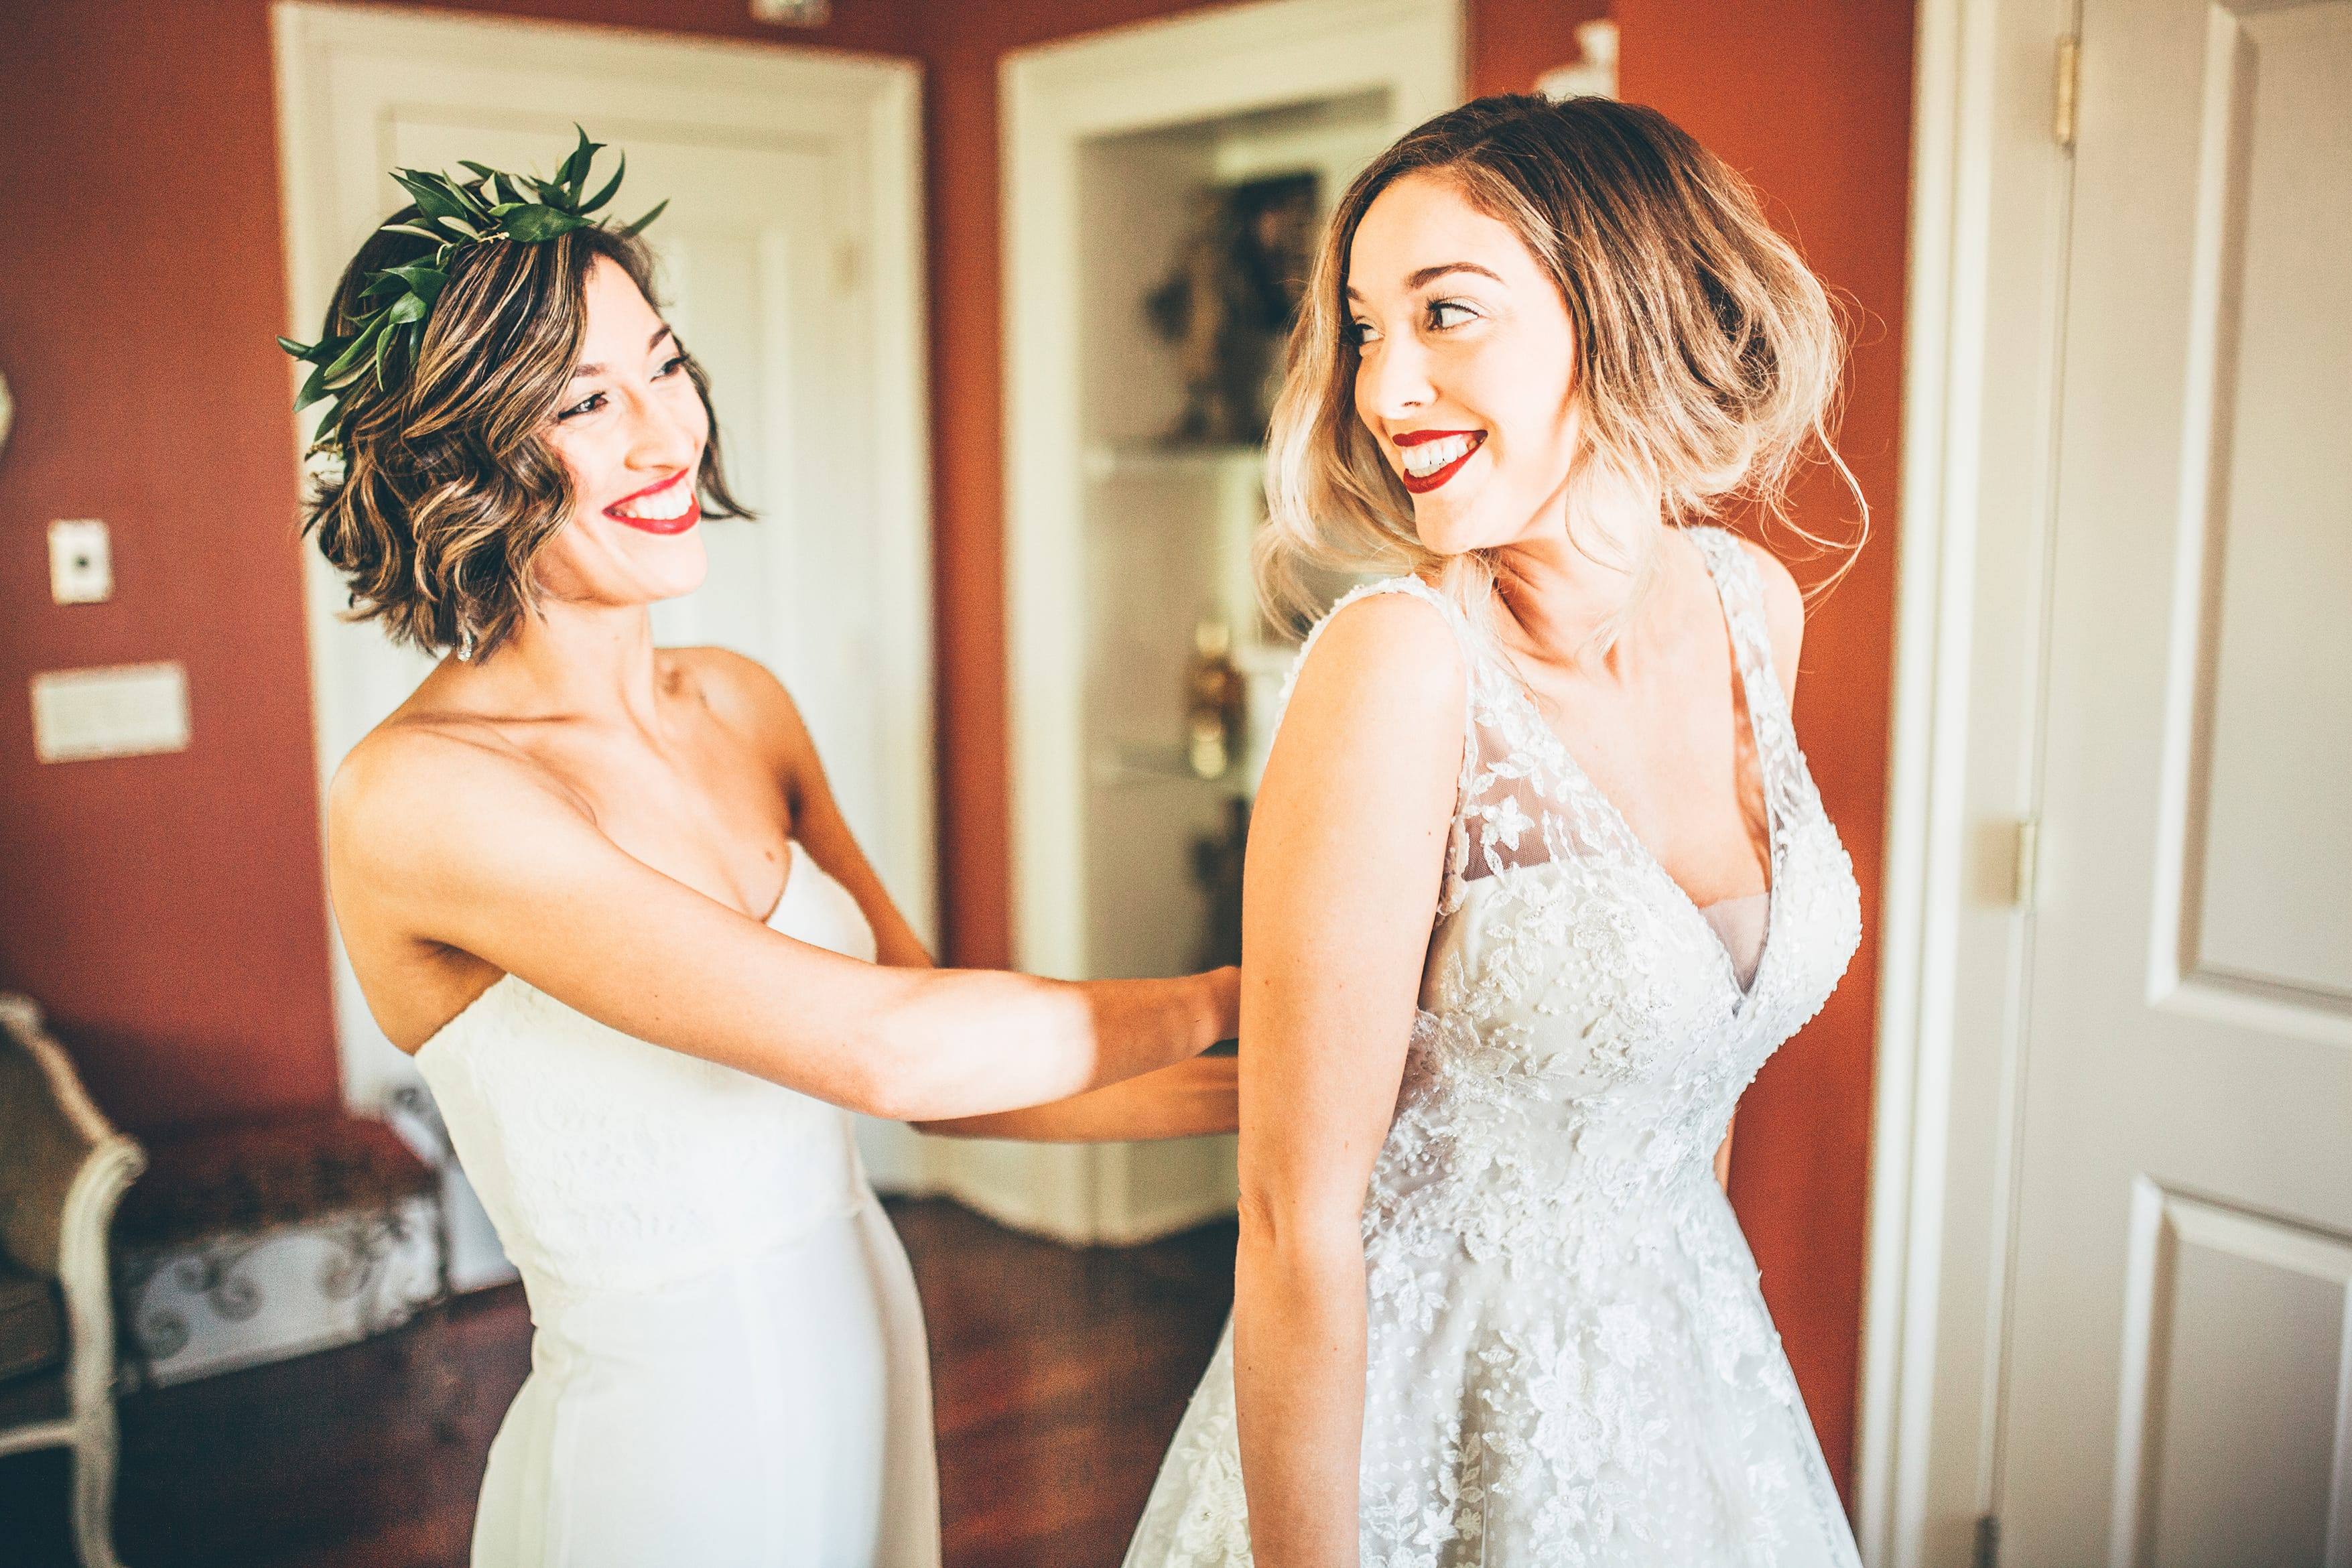 Maid Of Honor Etiquette For Wedding Dress Shopping Maggie Sottero,Short 7th Grade Short Teenage Dresses For Weddings